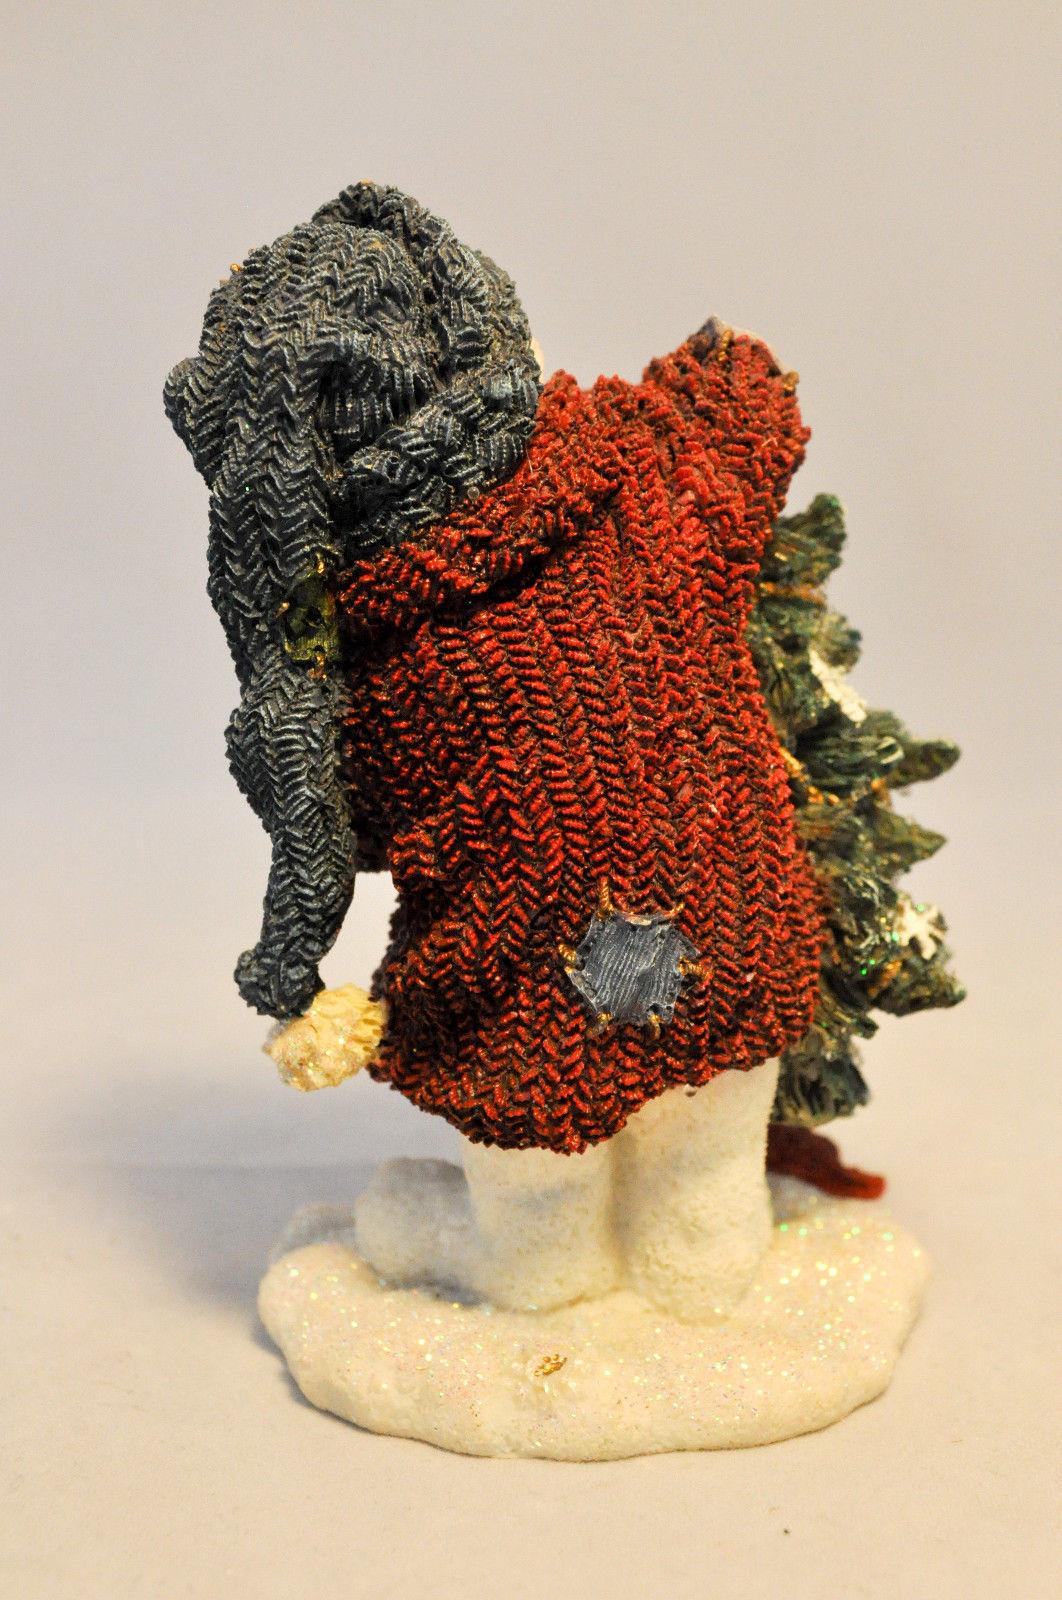 Boyds Bears & Friends: Douglas ... Sprucin' Up The Tree - Style 36524 image 6